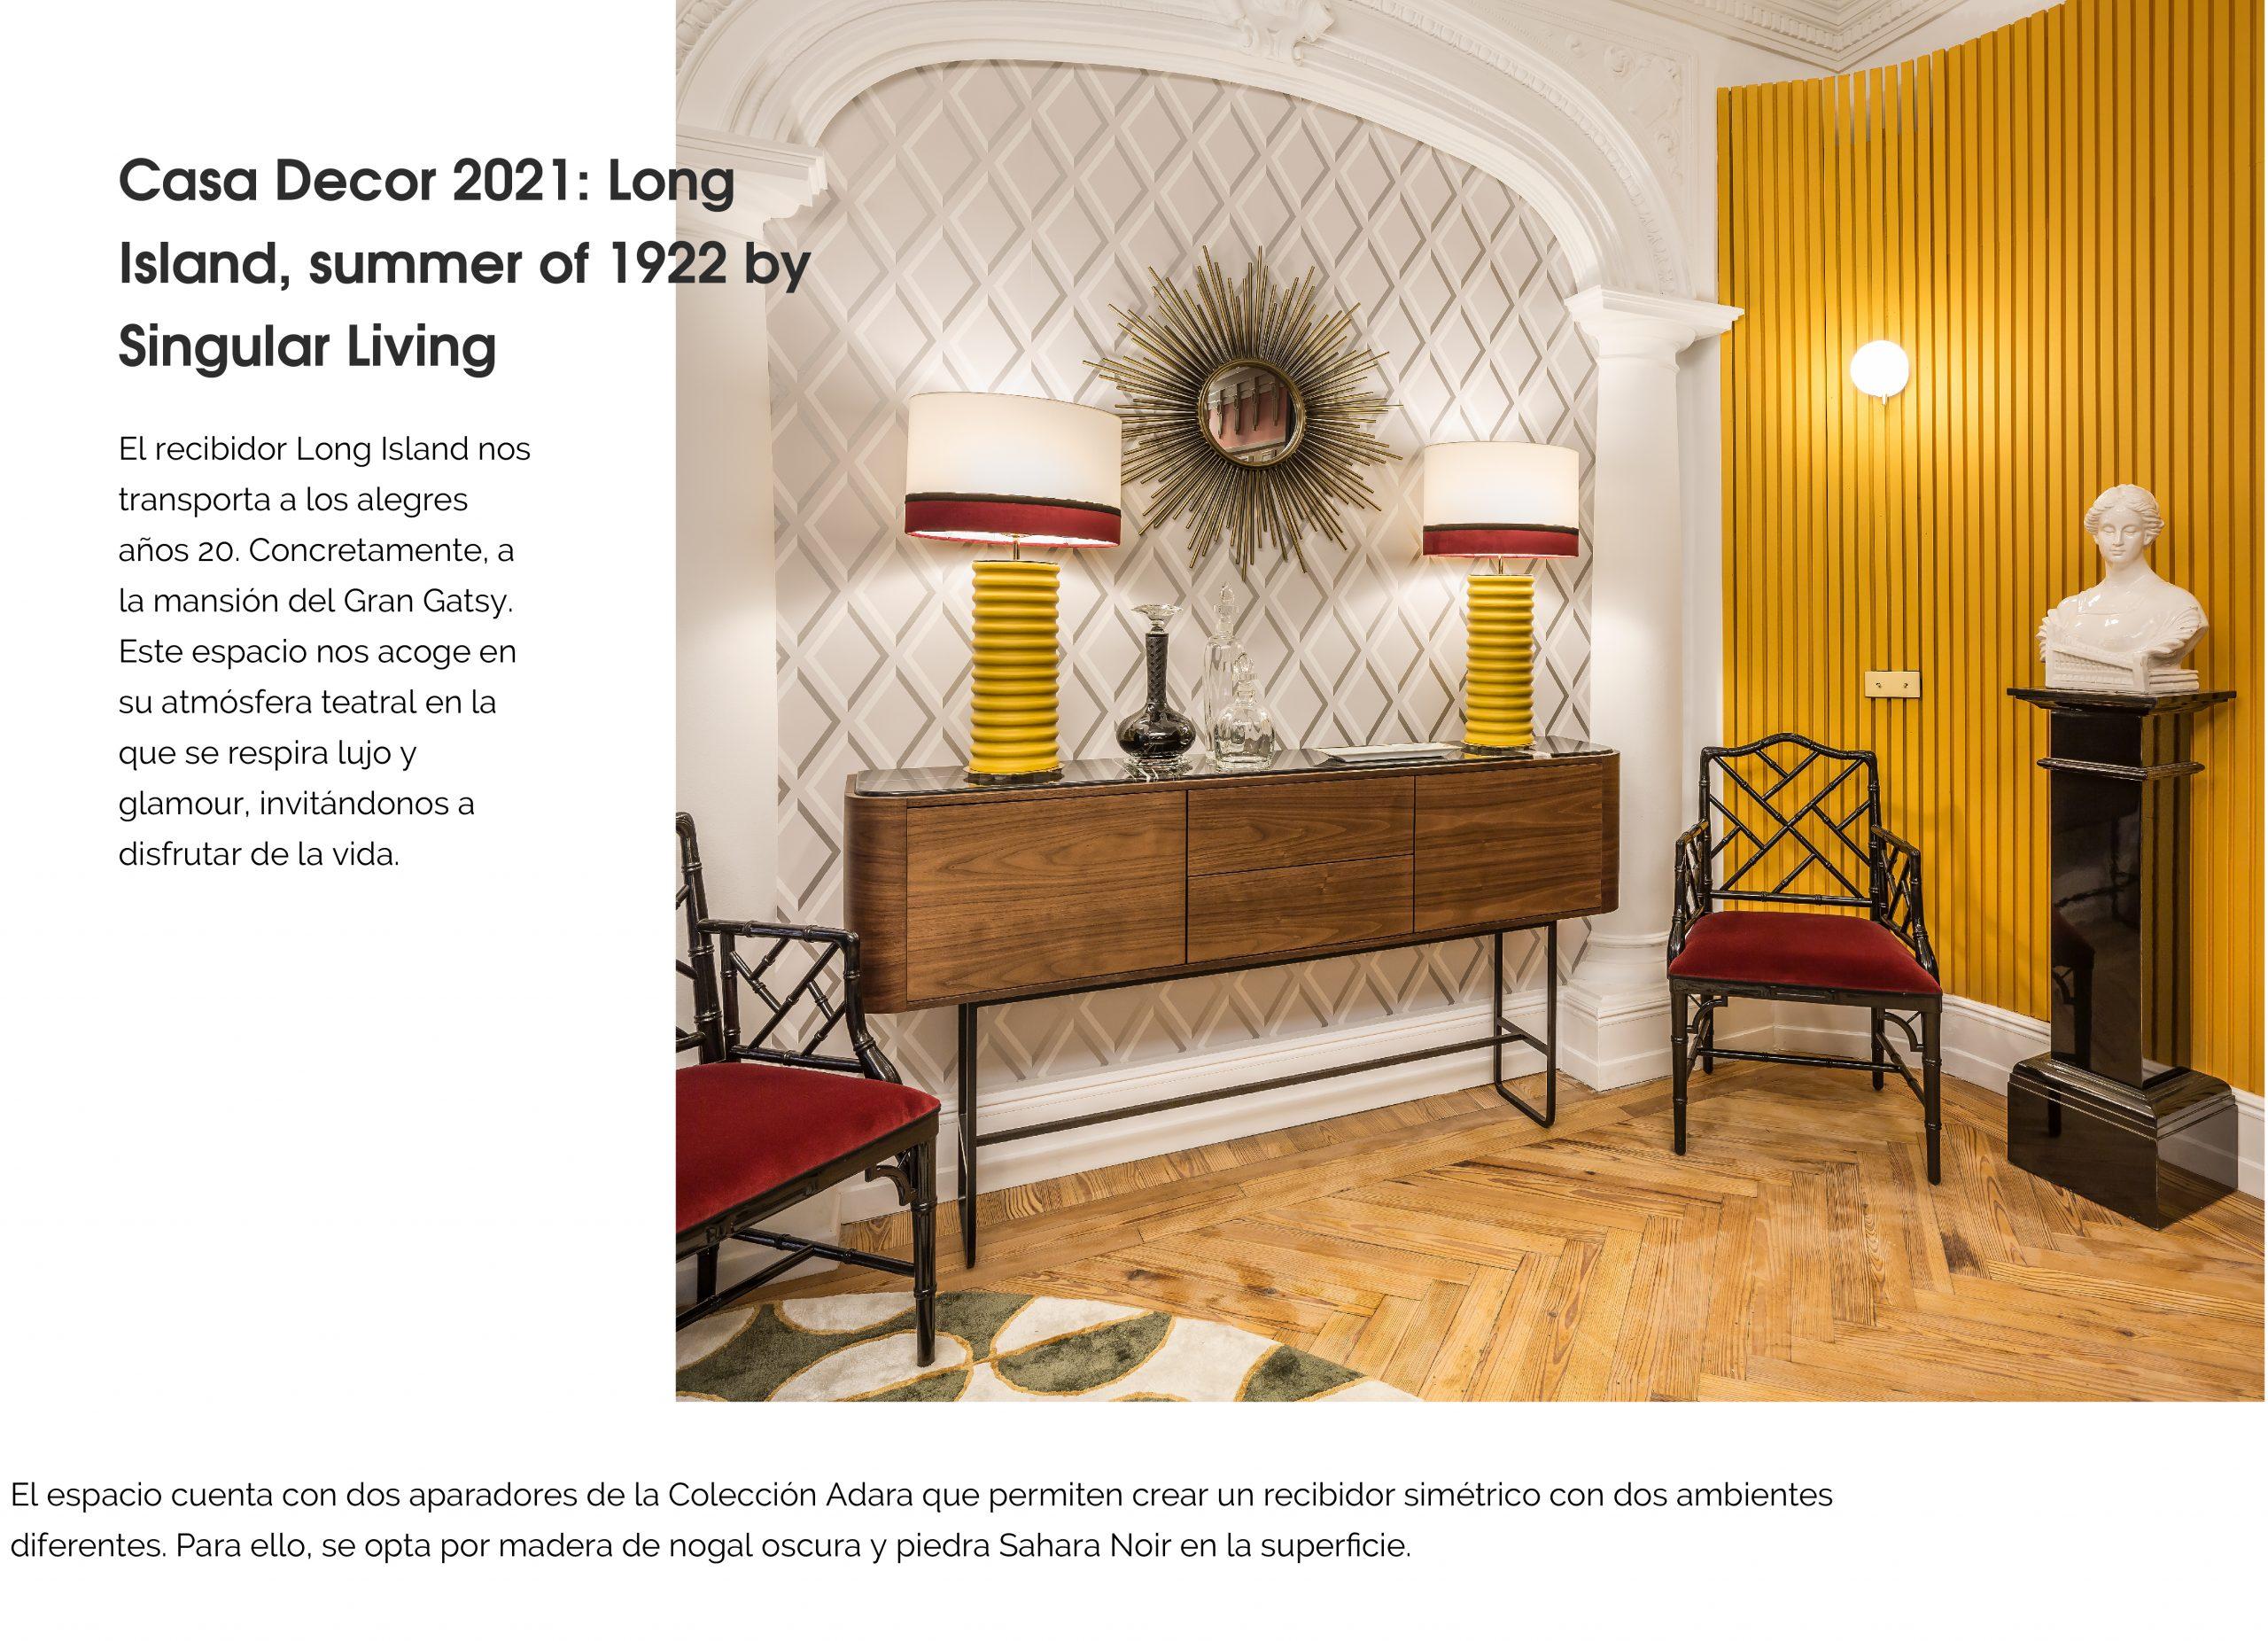 Casa Decor 2021 Momocca Singular Living